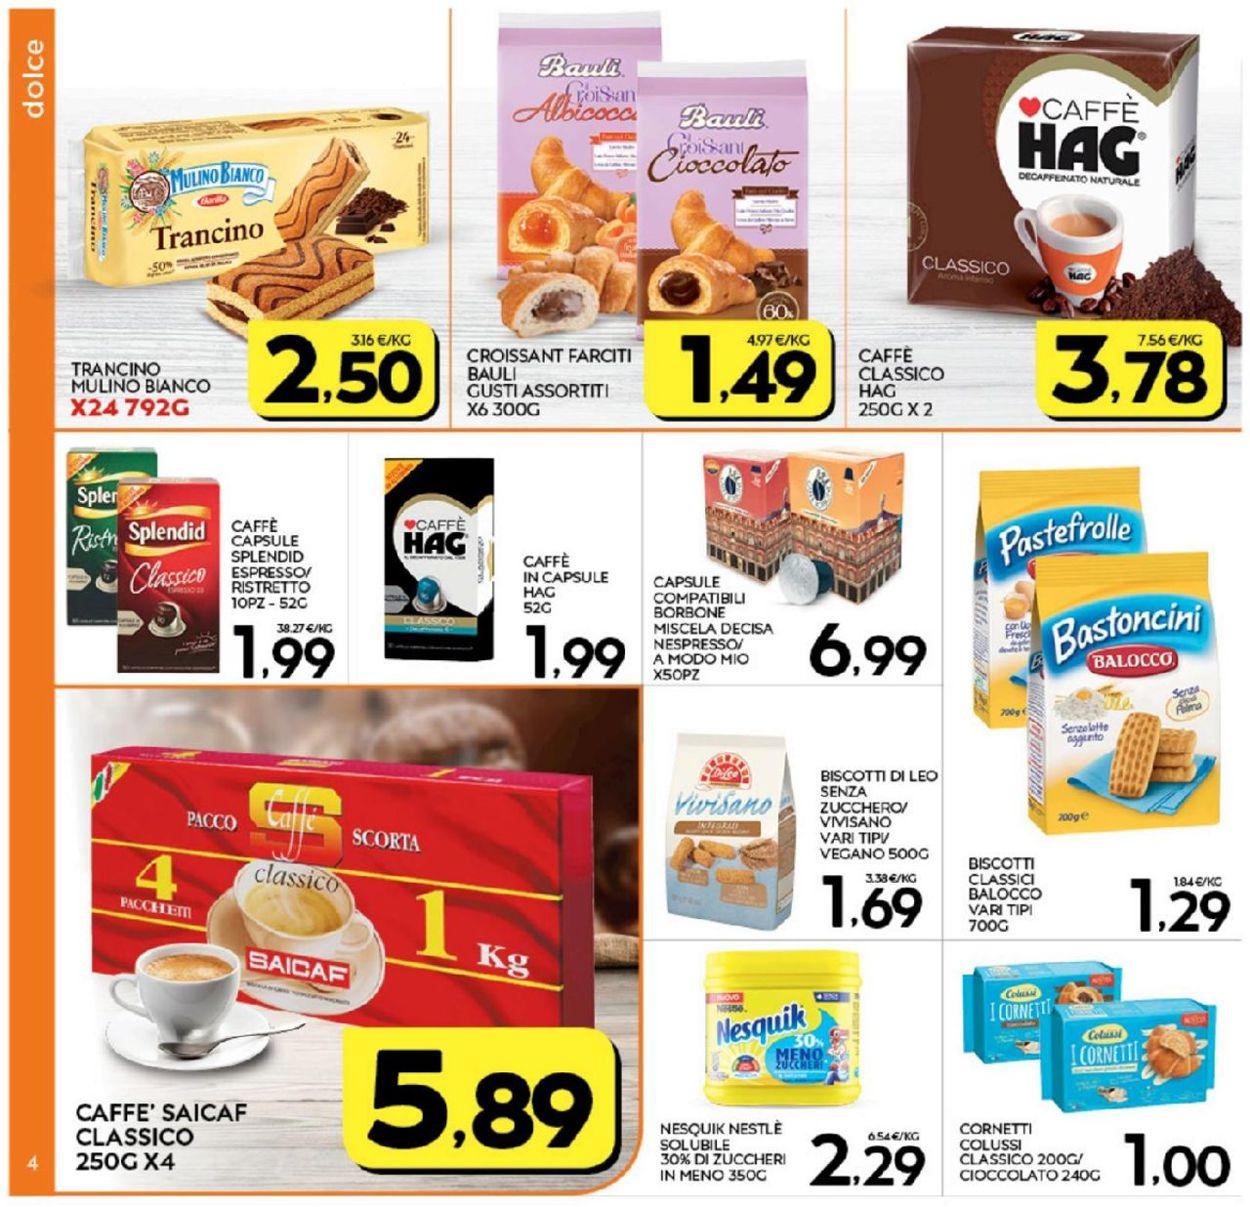 Volantino Interspar - Offerte 16/05-26/05/2019 (Pagina 4)